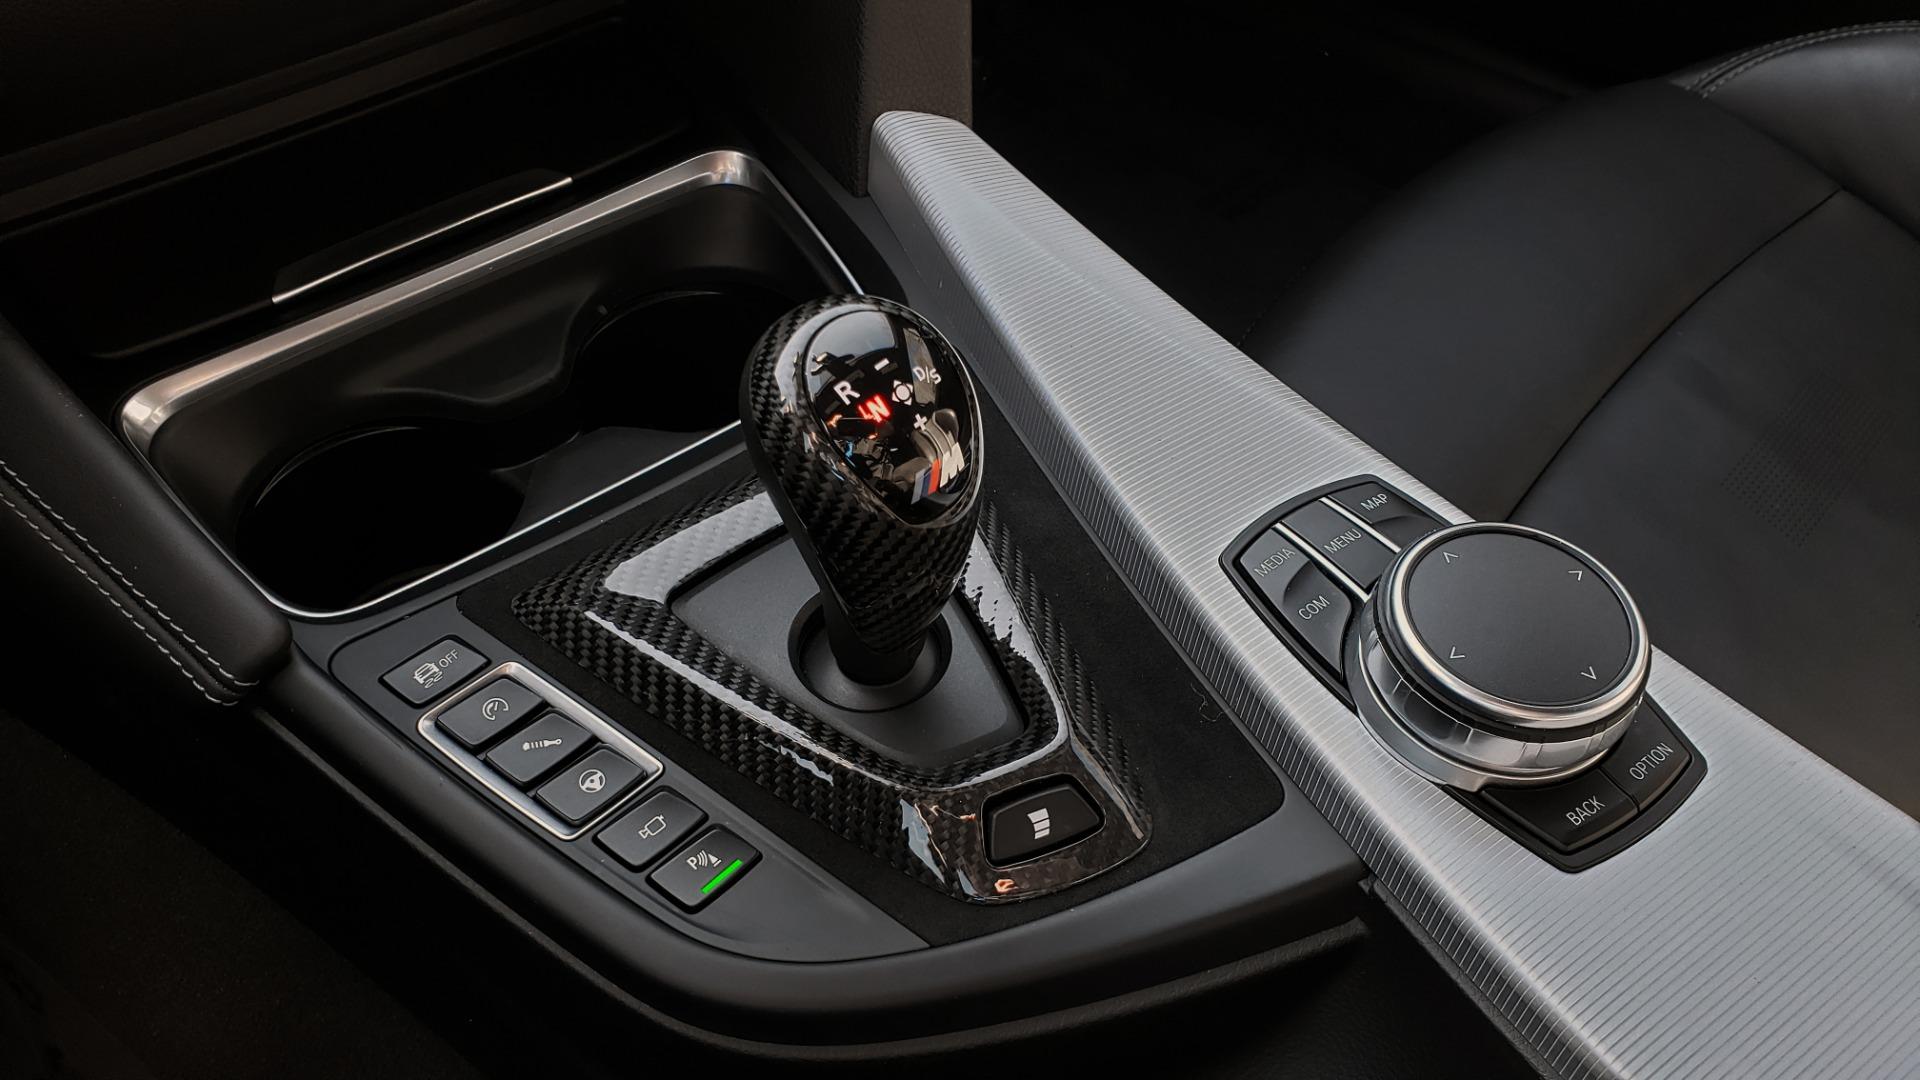 Used 2018 BMW M4 COMP PKG / EXEC / M-DRIVER / PARK CNTRL / ACTIVE BLIND SPOT for sale $45,449 at Formula Imports in Charlotte NC 28227 52